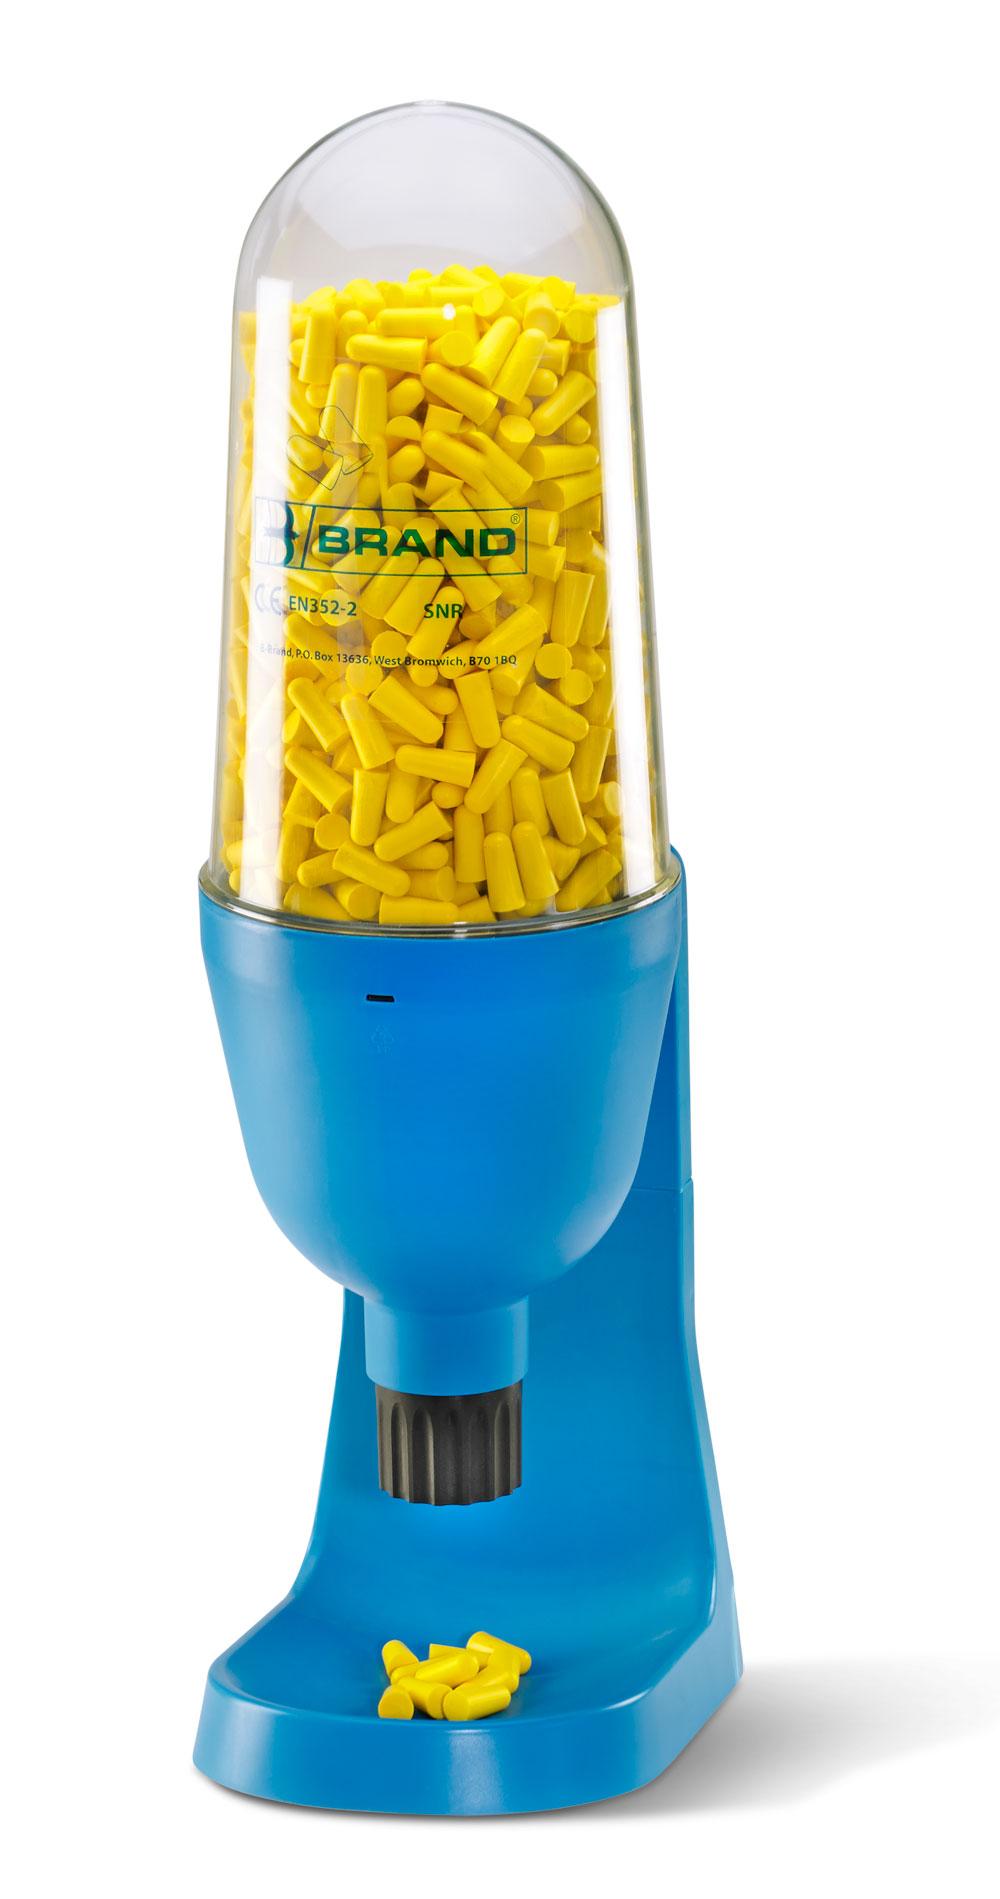 Bbep500ds B Brand Ear Plug Dispenser 500 Yellow